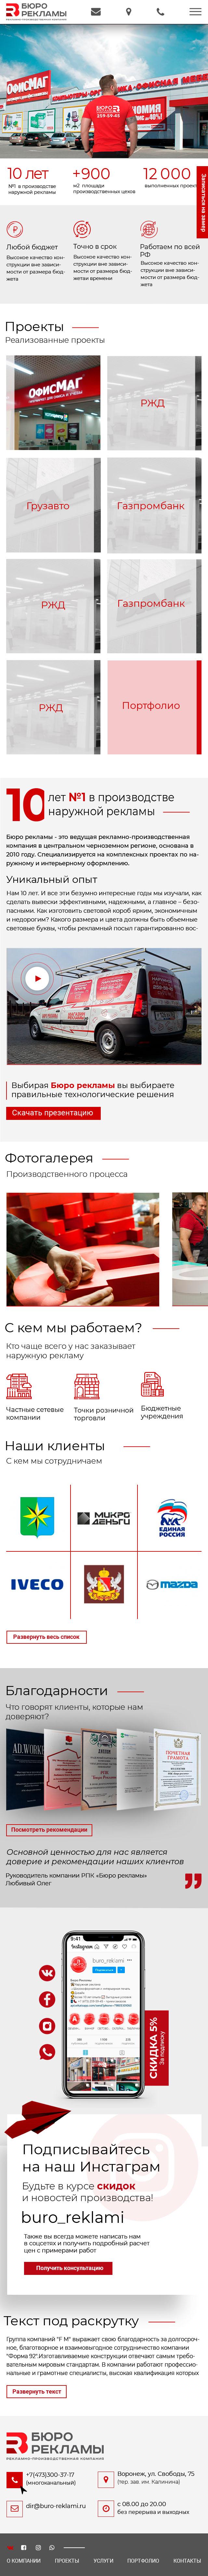 b2b сайты примеры Бюро рекламы 640 px